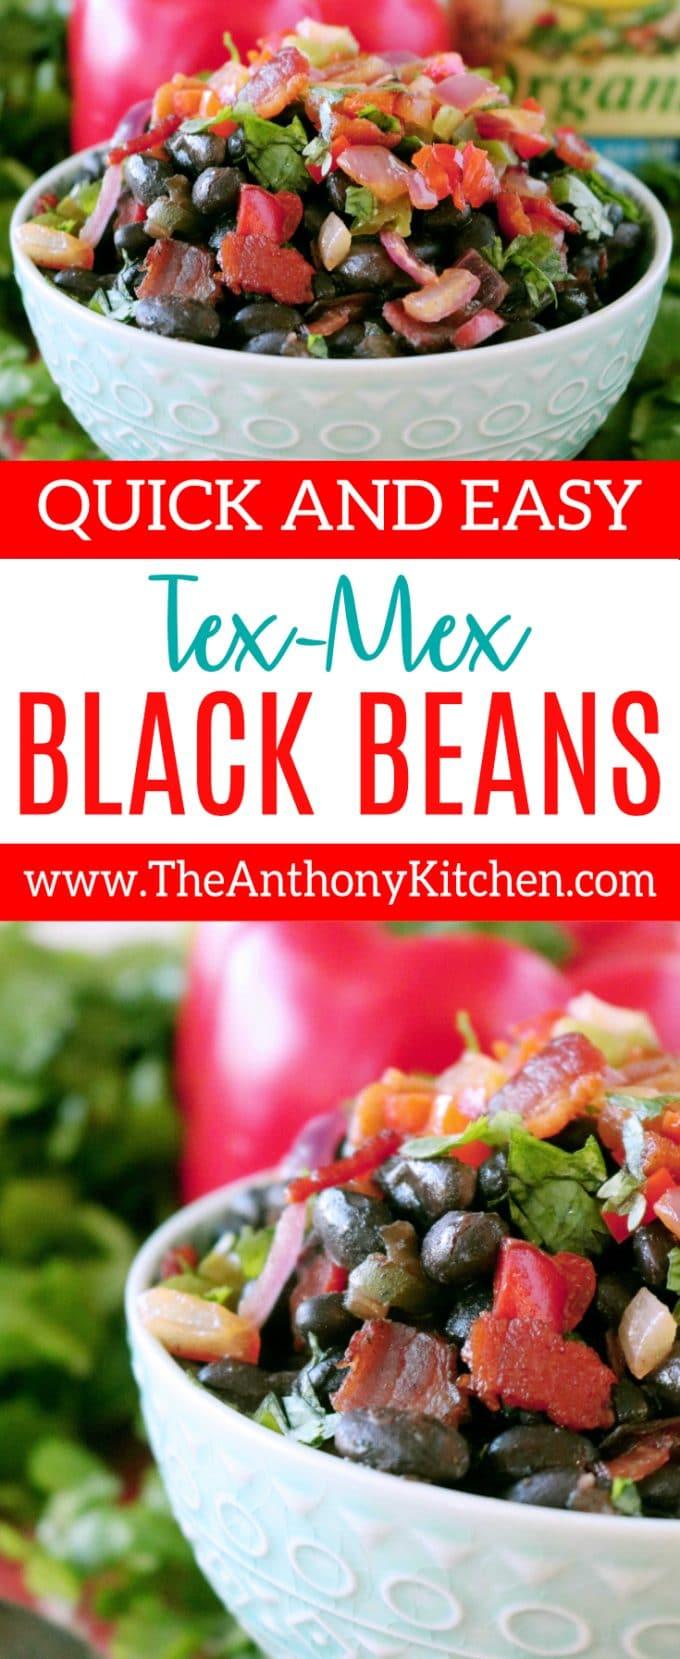 EASY CANNED BLACK BEAN RECIPE | TEX MEX BLACK BEANS